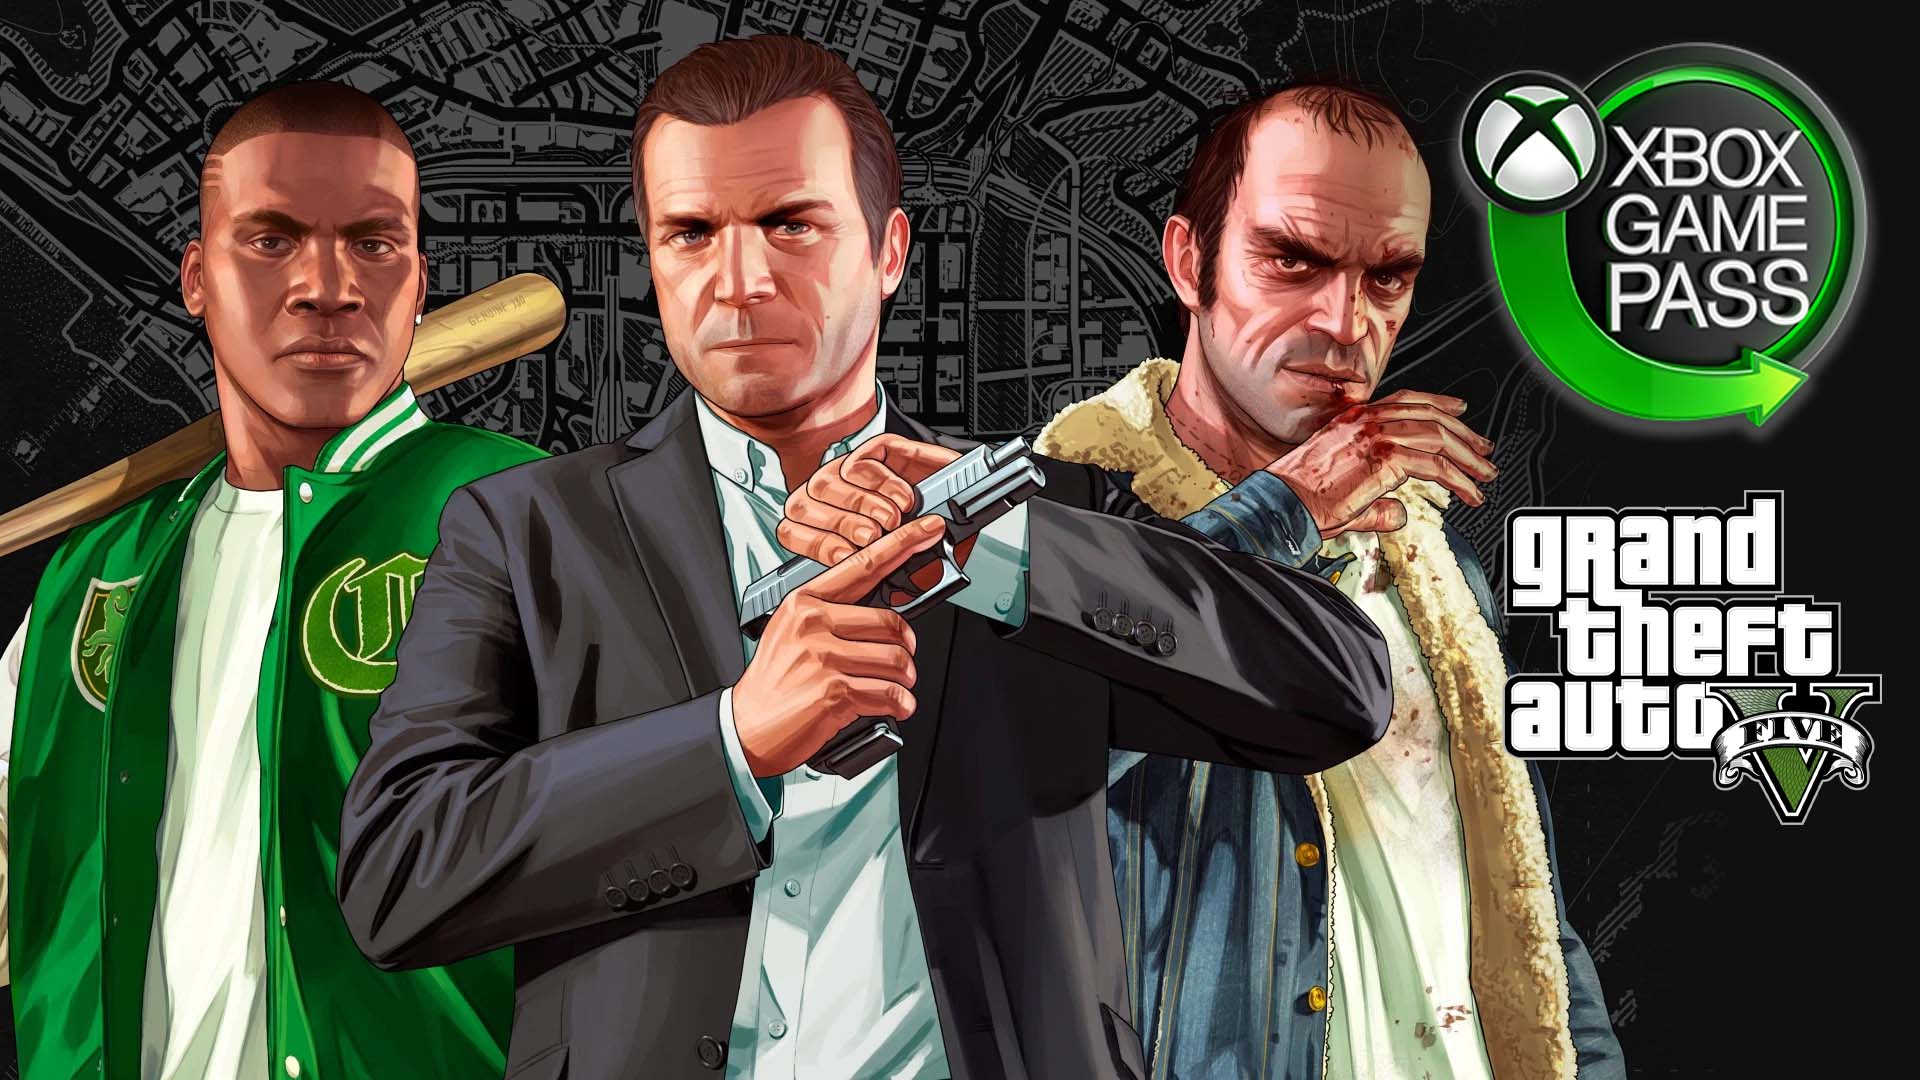 Grand Theft Auto V Xbox Game Pass